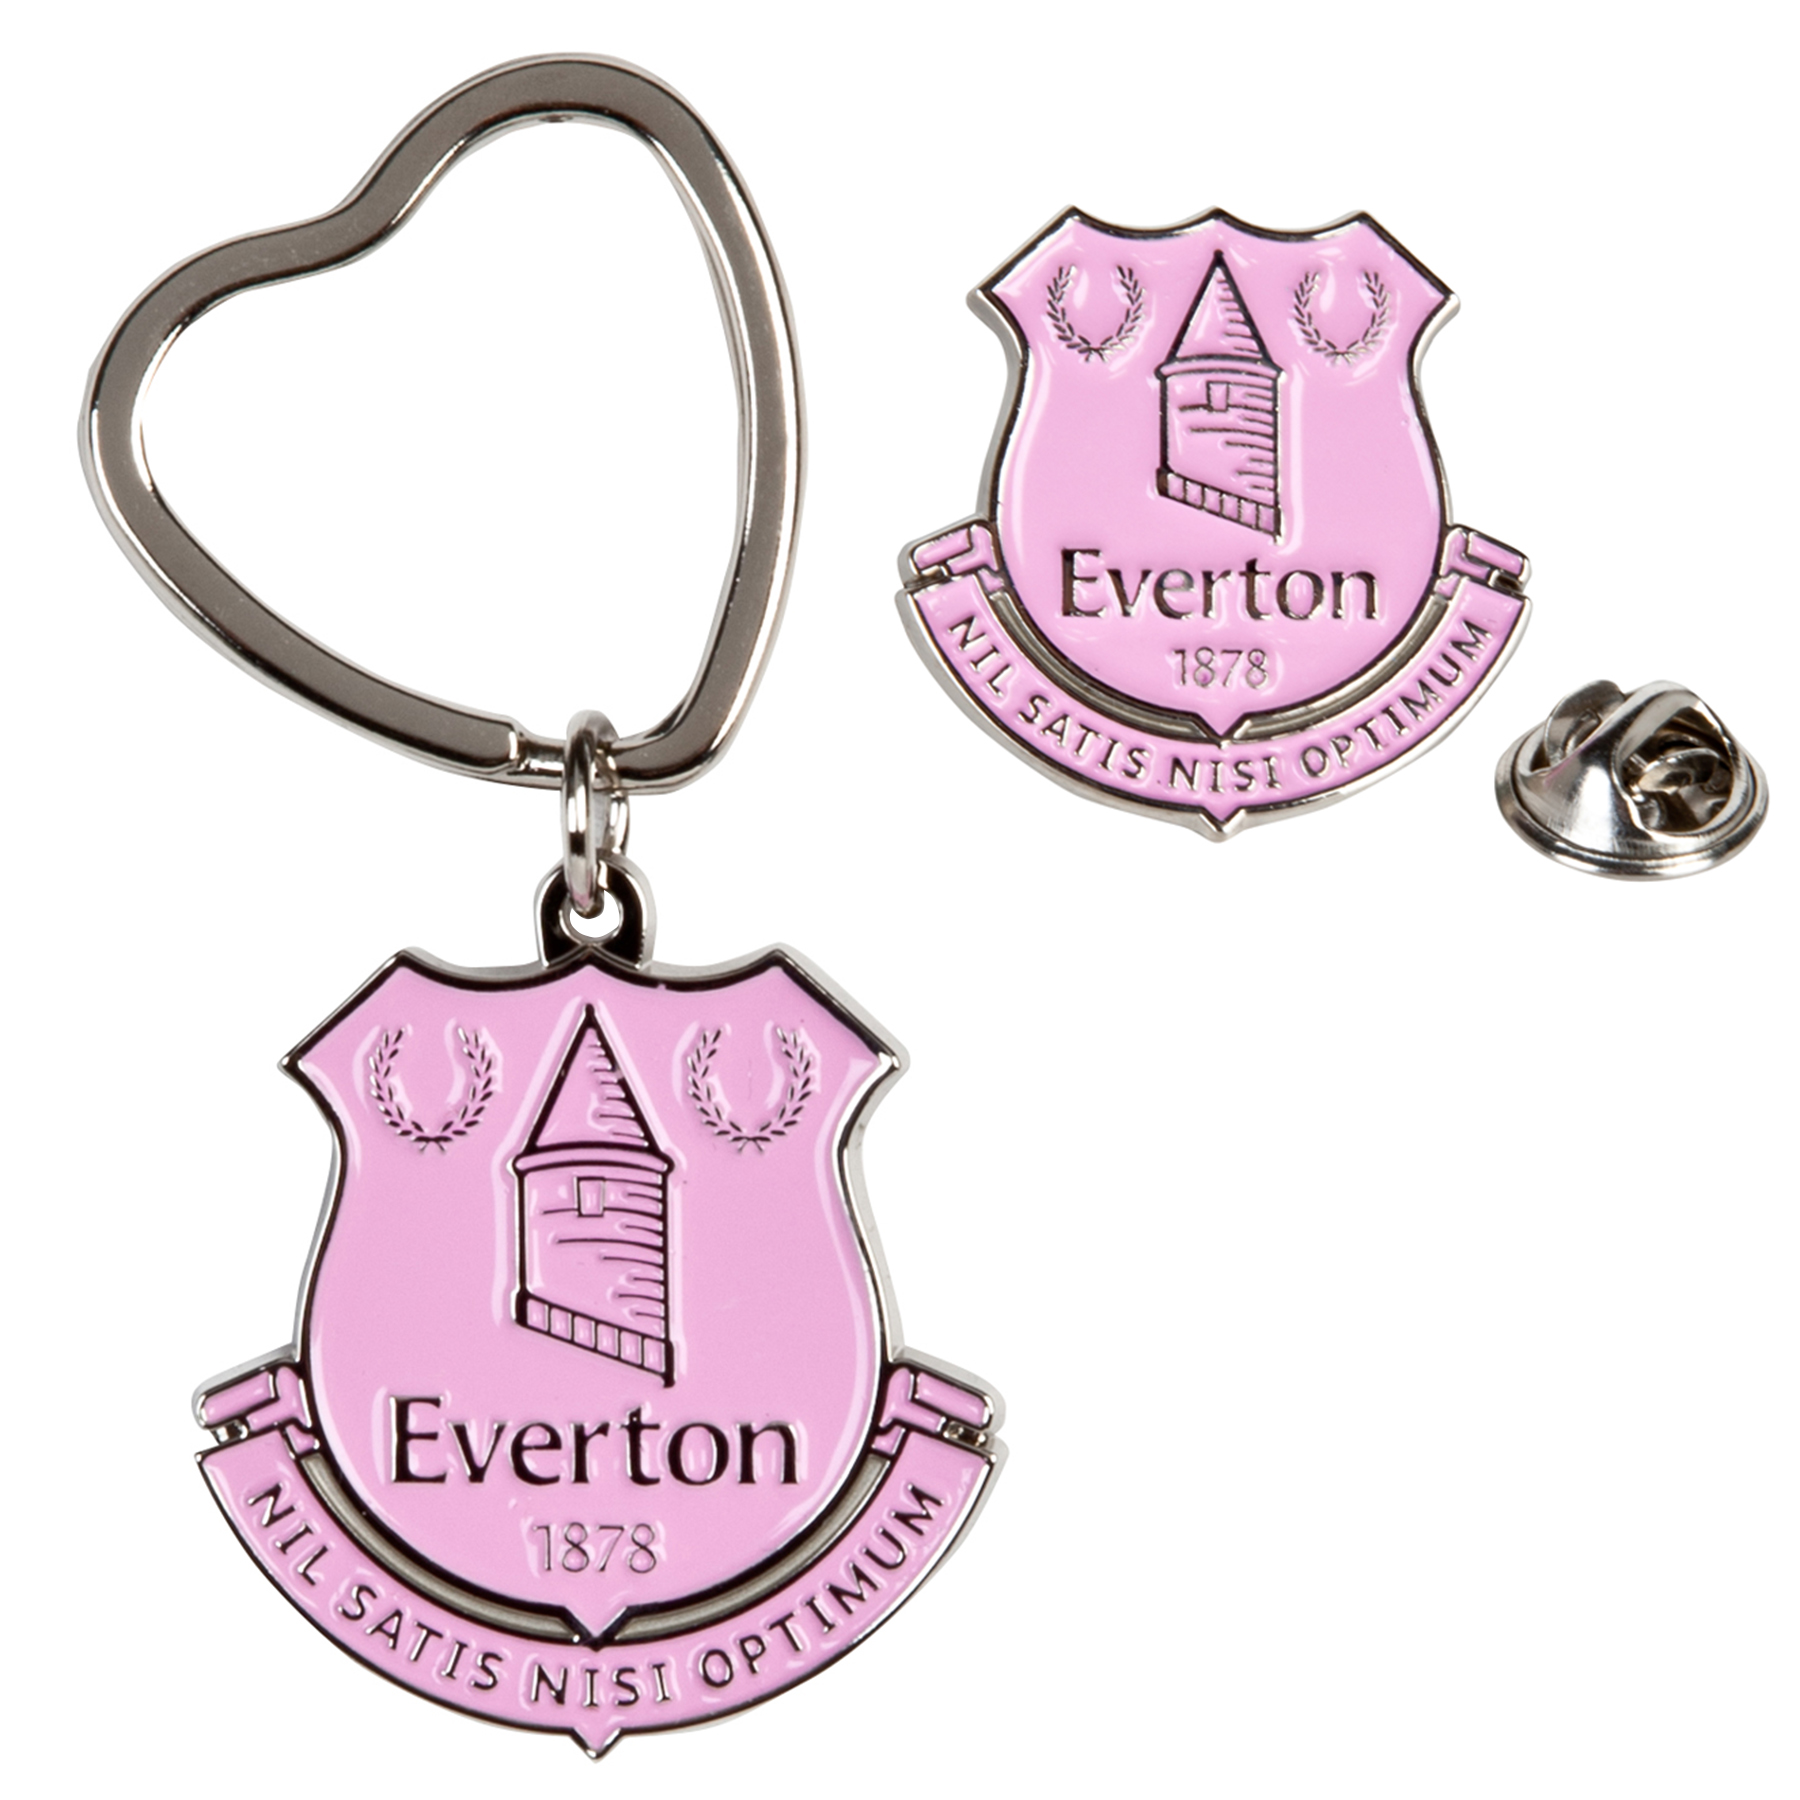 Image of Everton Badge and Keyring Set - Pink